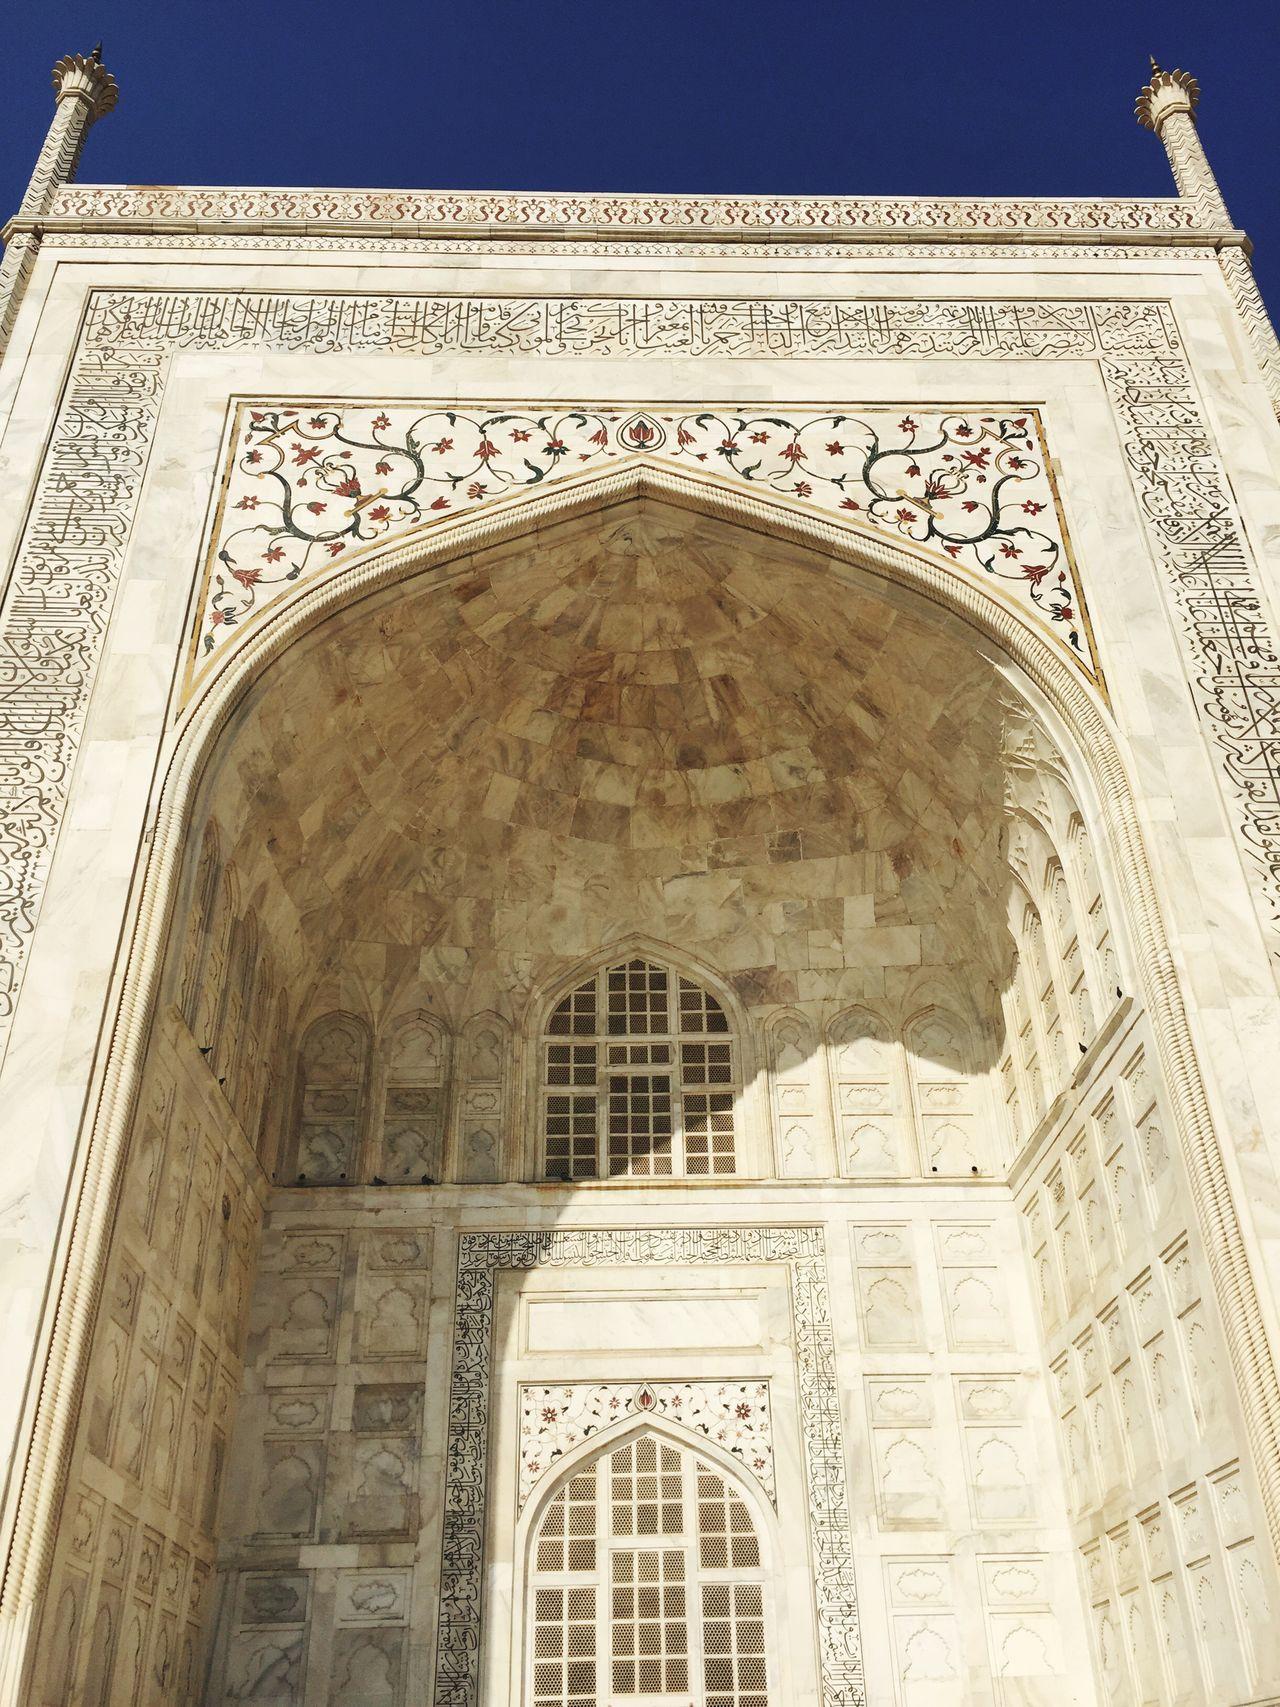 Architecture Mughalarchitecture History Wonders Of The World Mausoleum Tourism Monument Taj Mahal Incredible India Travel Destinations India